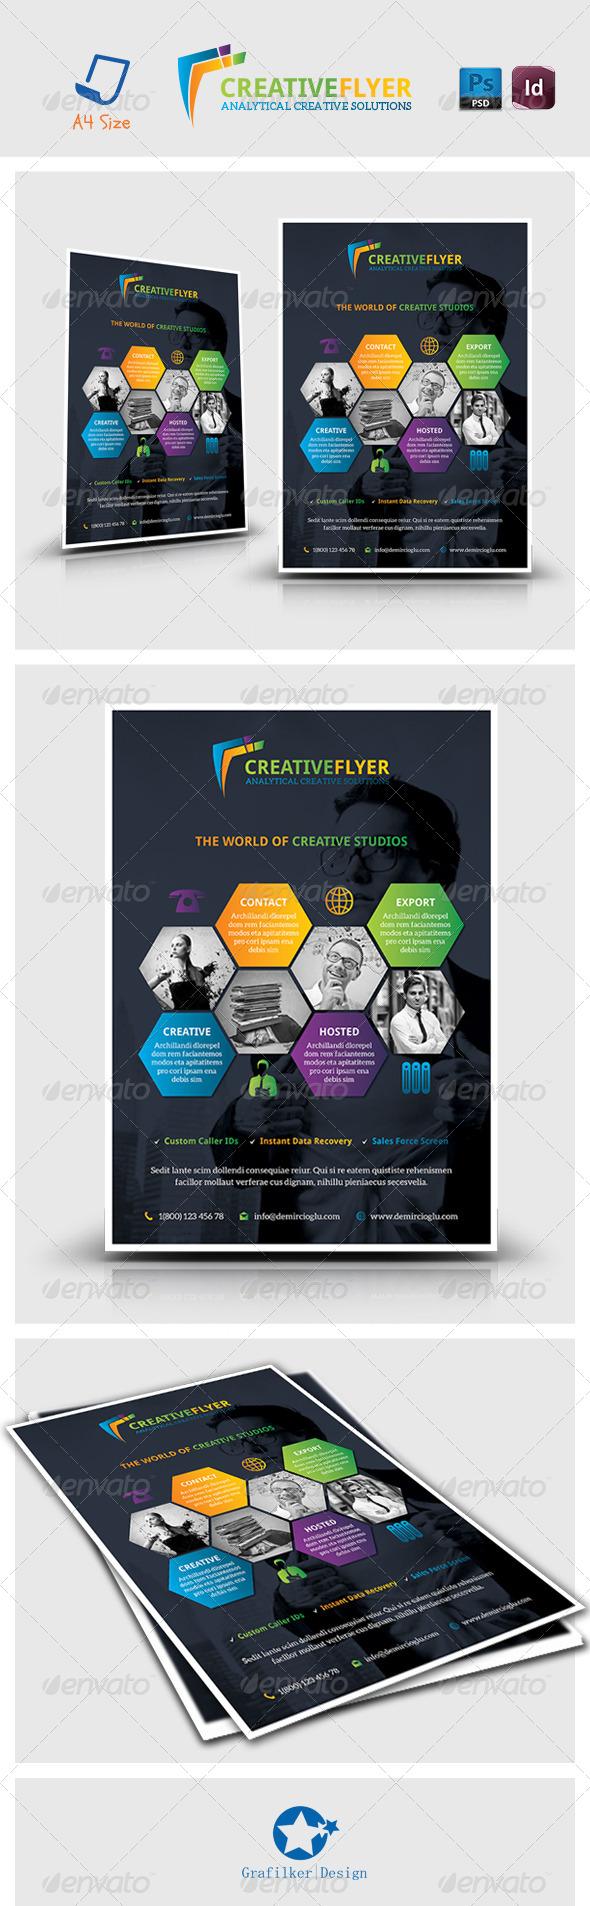 GraphicRiver Creative Studio Flyer Templates 7151821